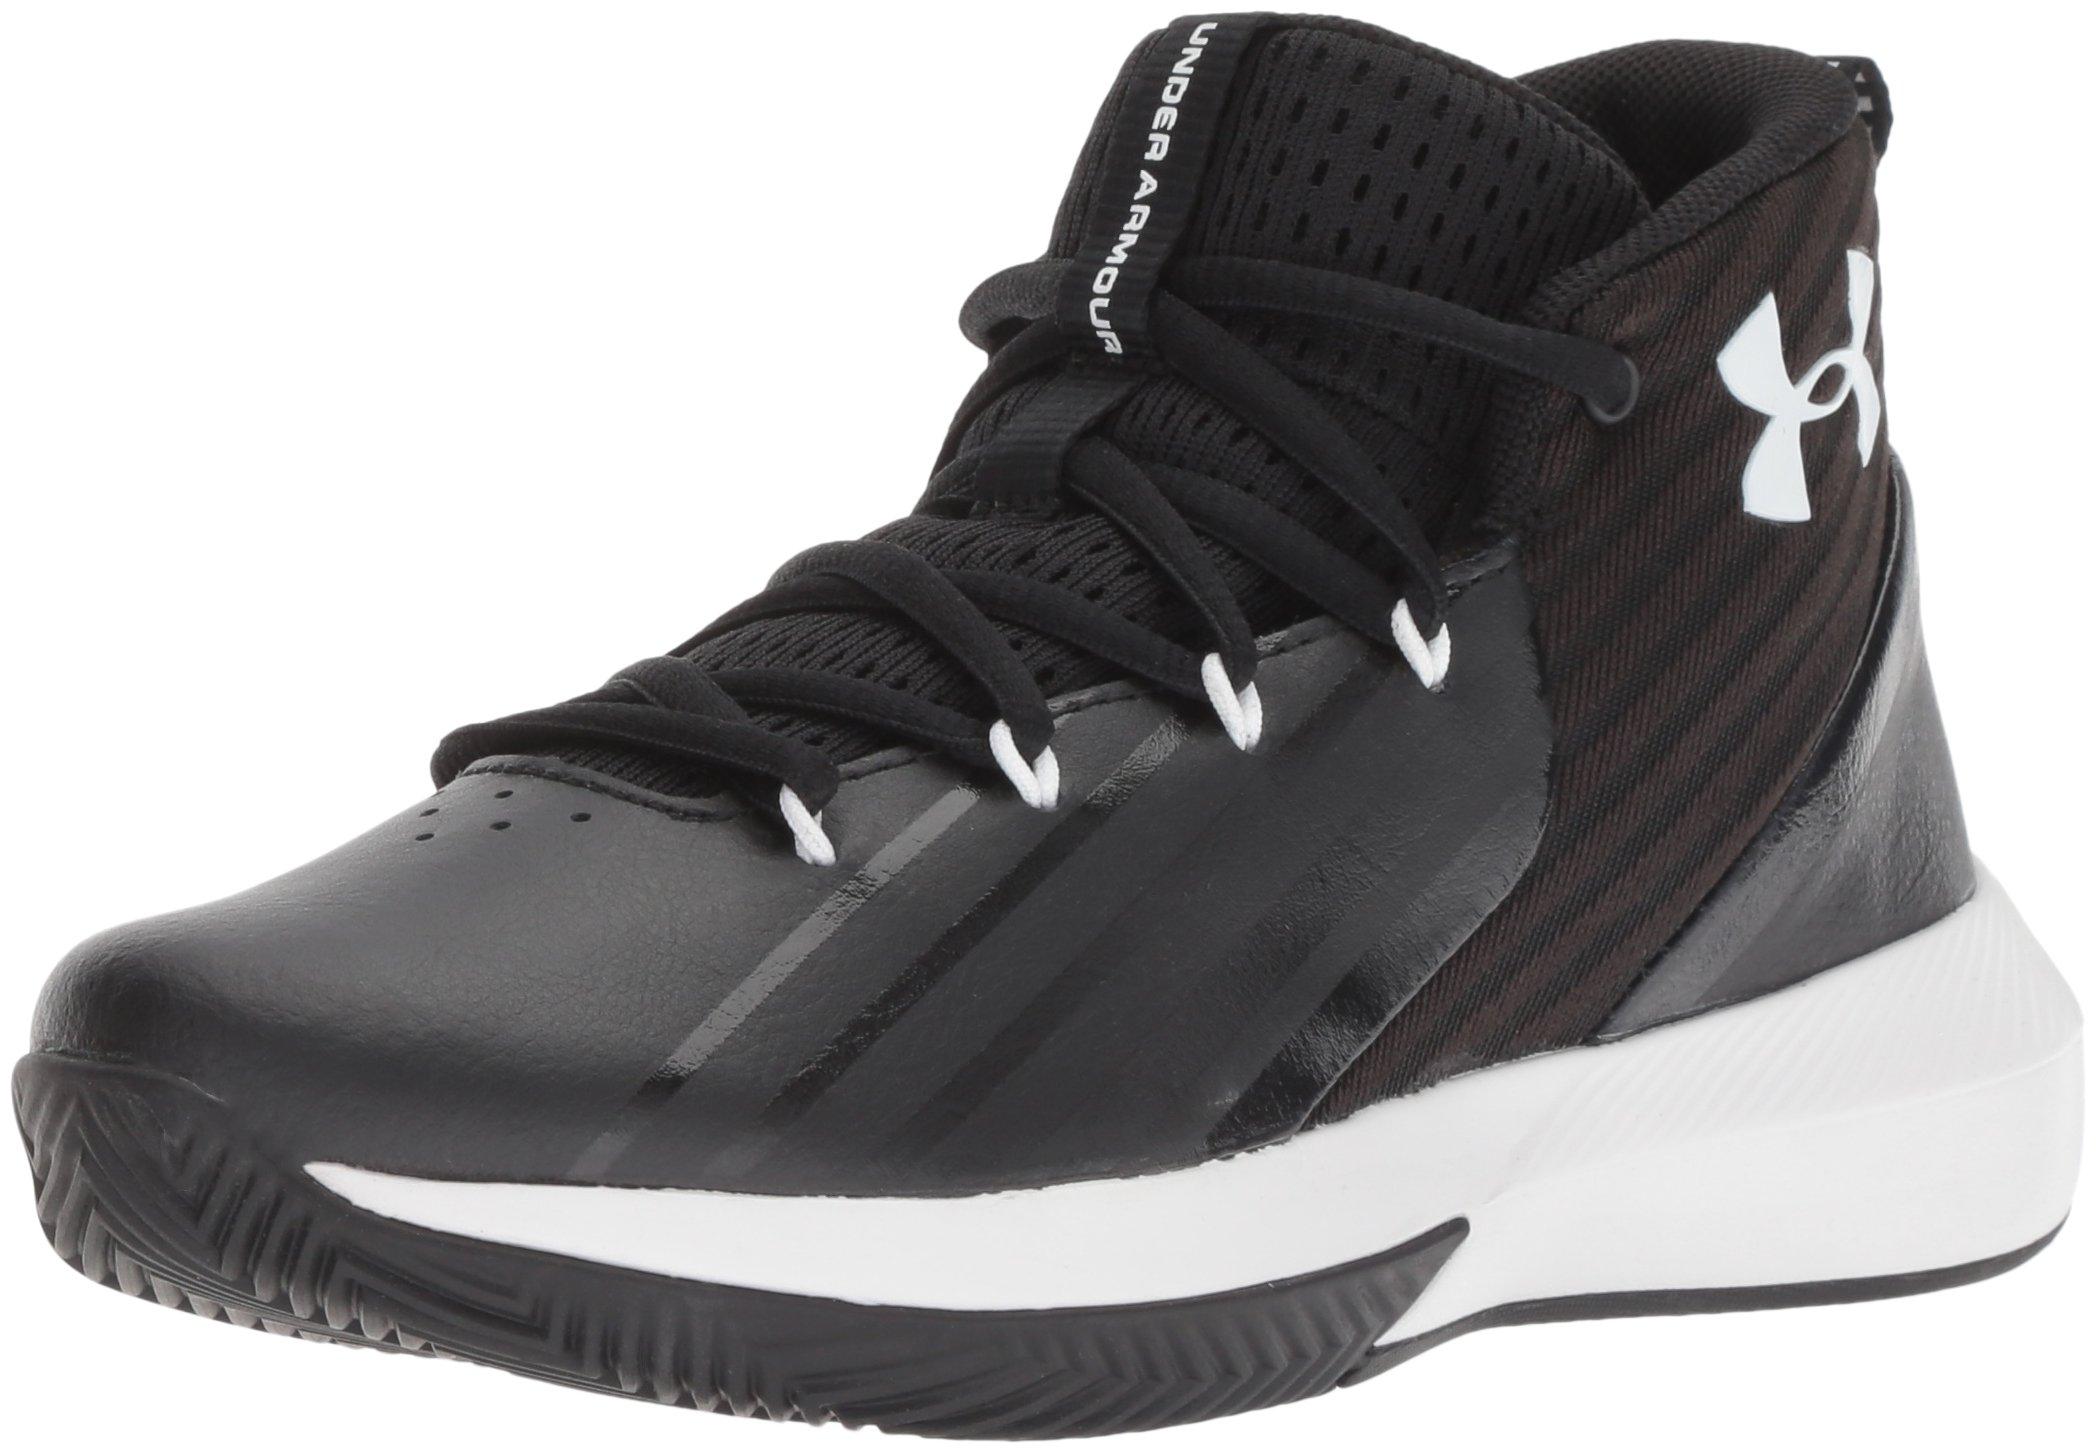 Under Armour Boys' Grade School Launch Basketball Shoe, Black (002)/White, 5